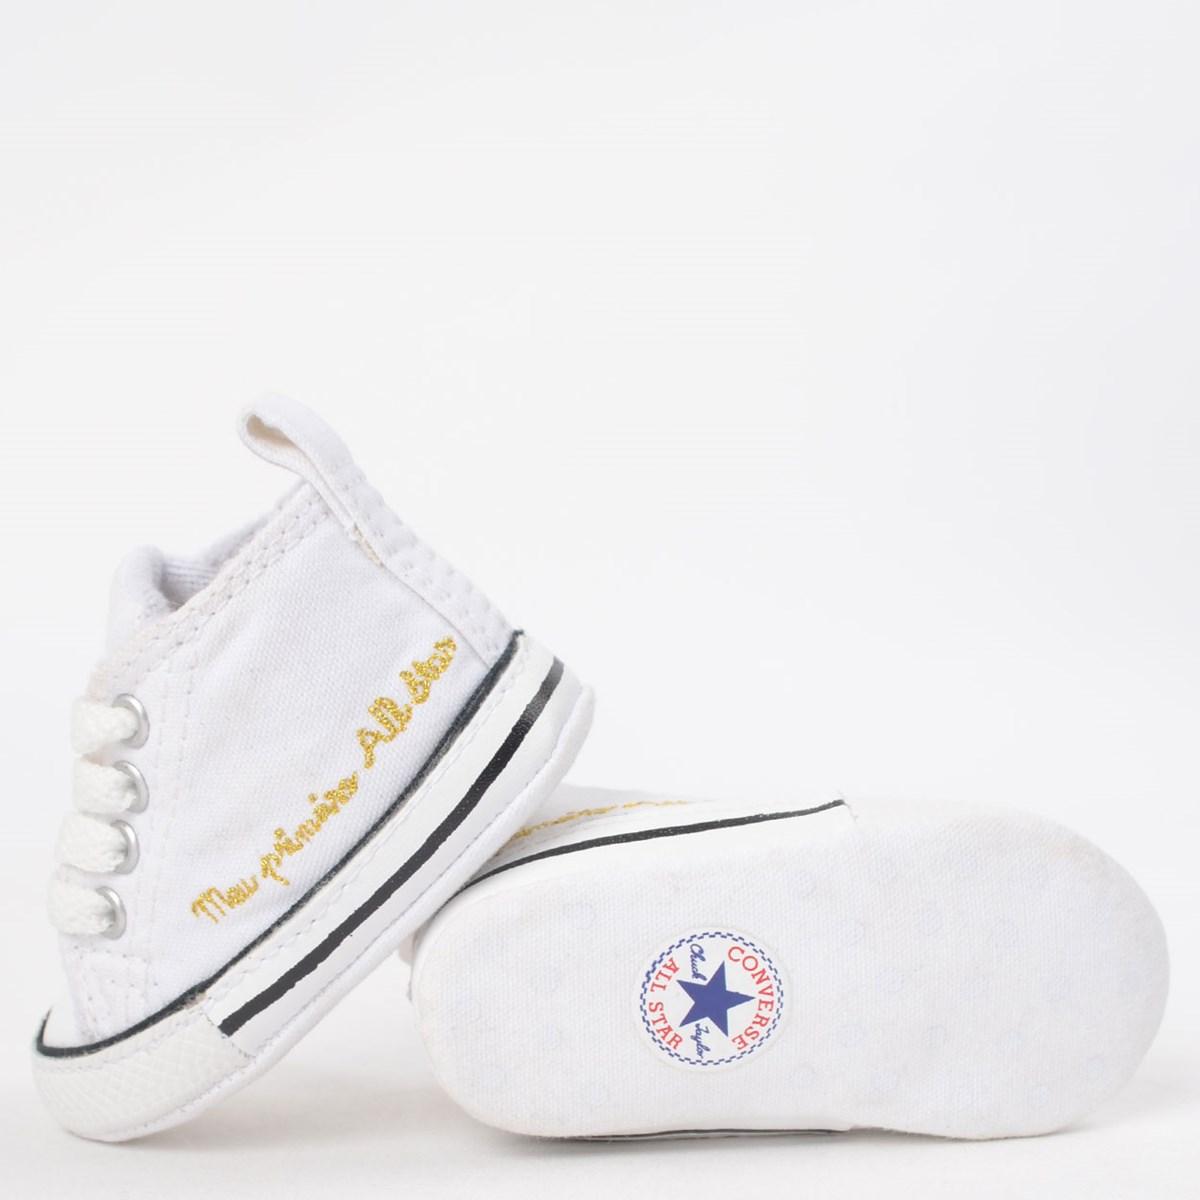 Tênis Converse Chuck Taylor All Star My First All Star Kids Branco Branco CK04400003